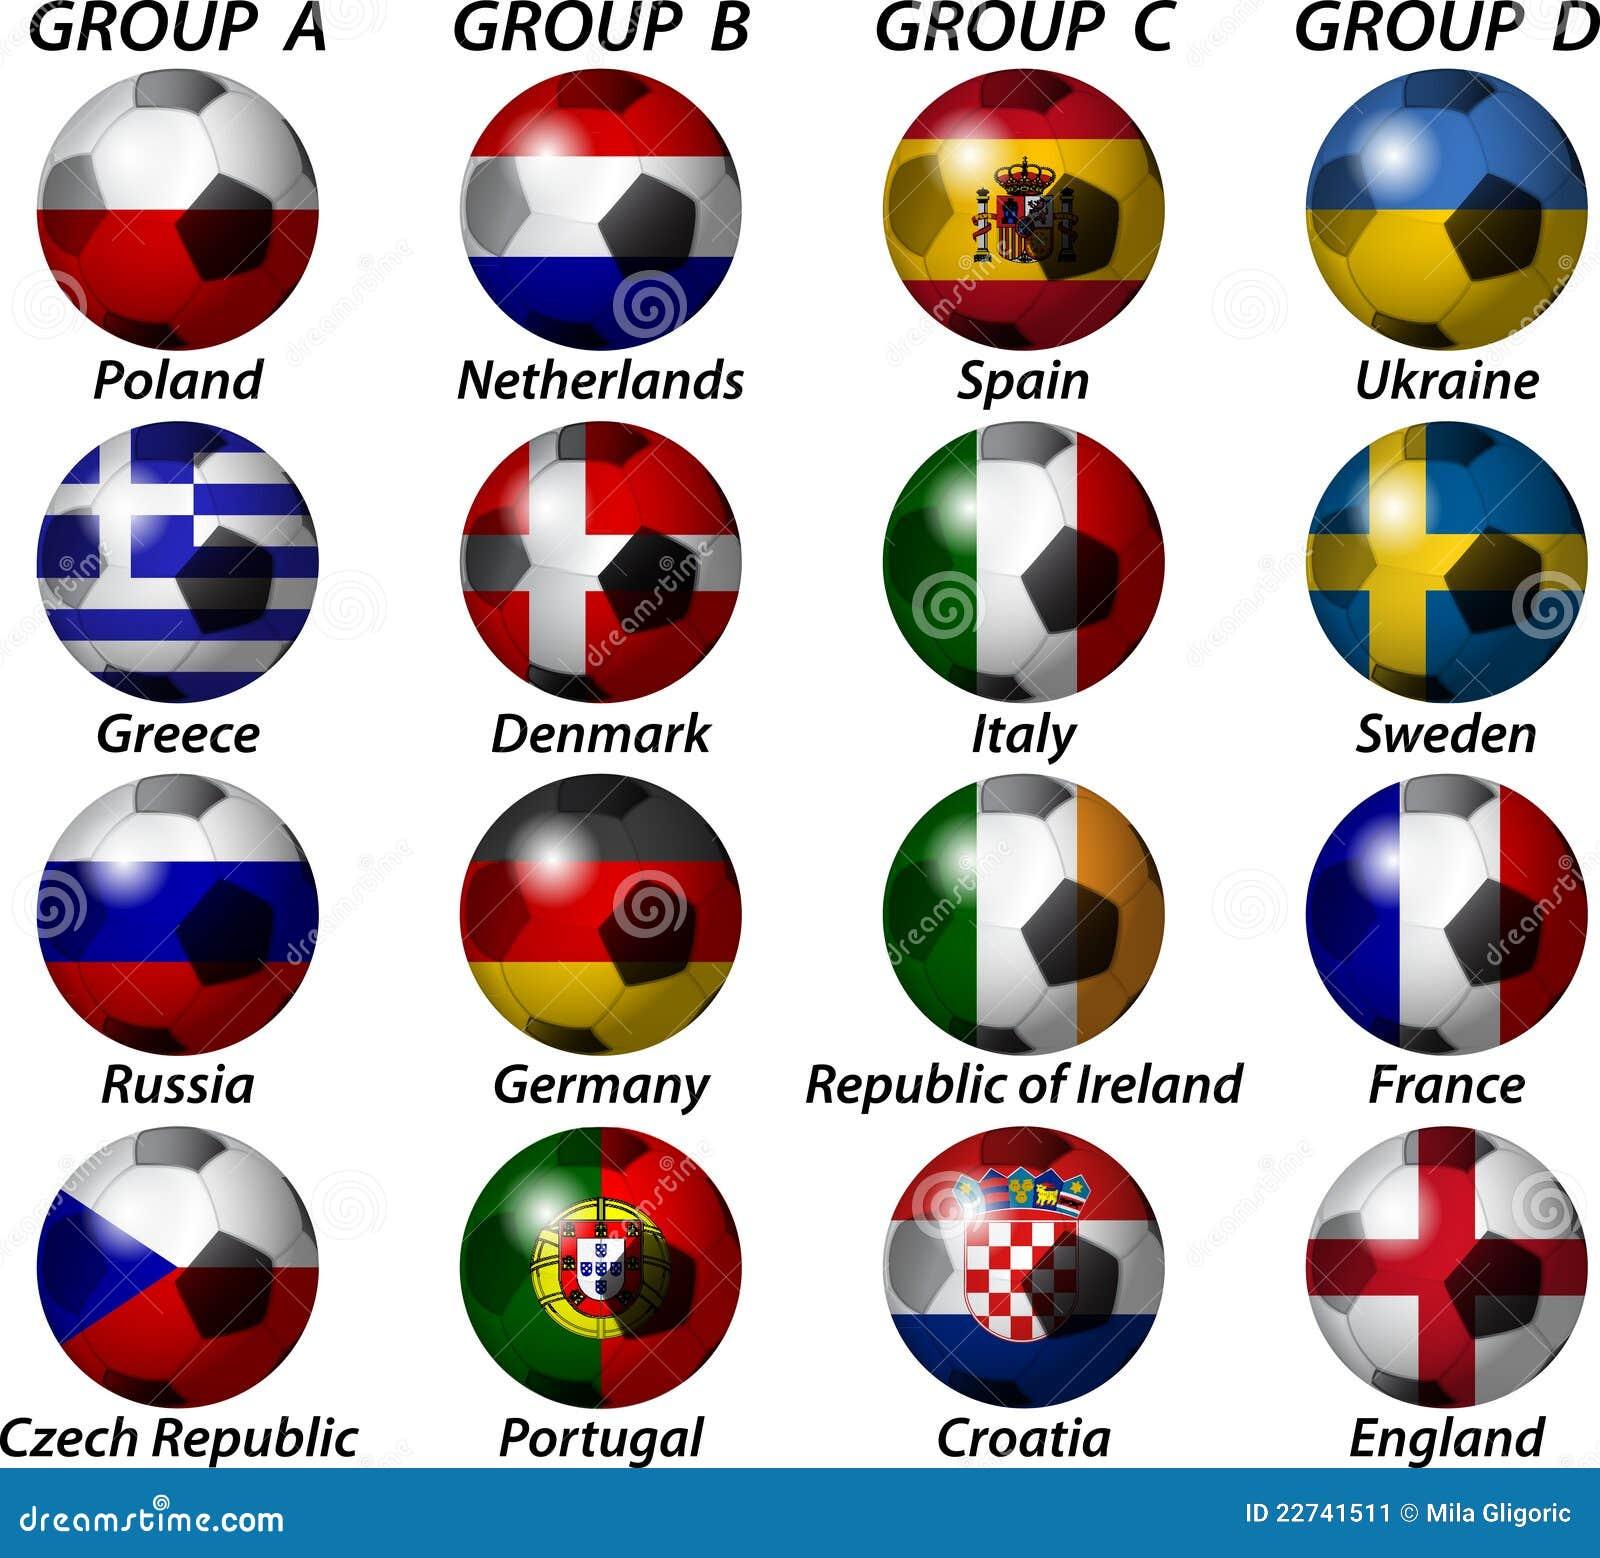 Euro dell UEFA 2012 gruppi